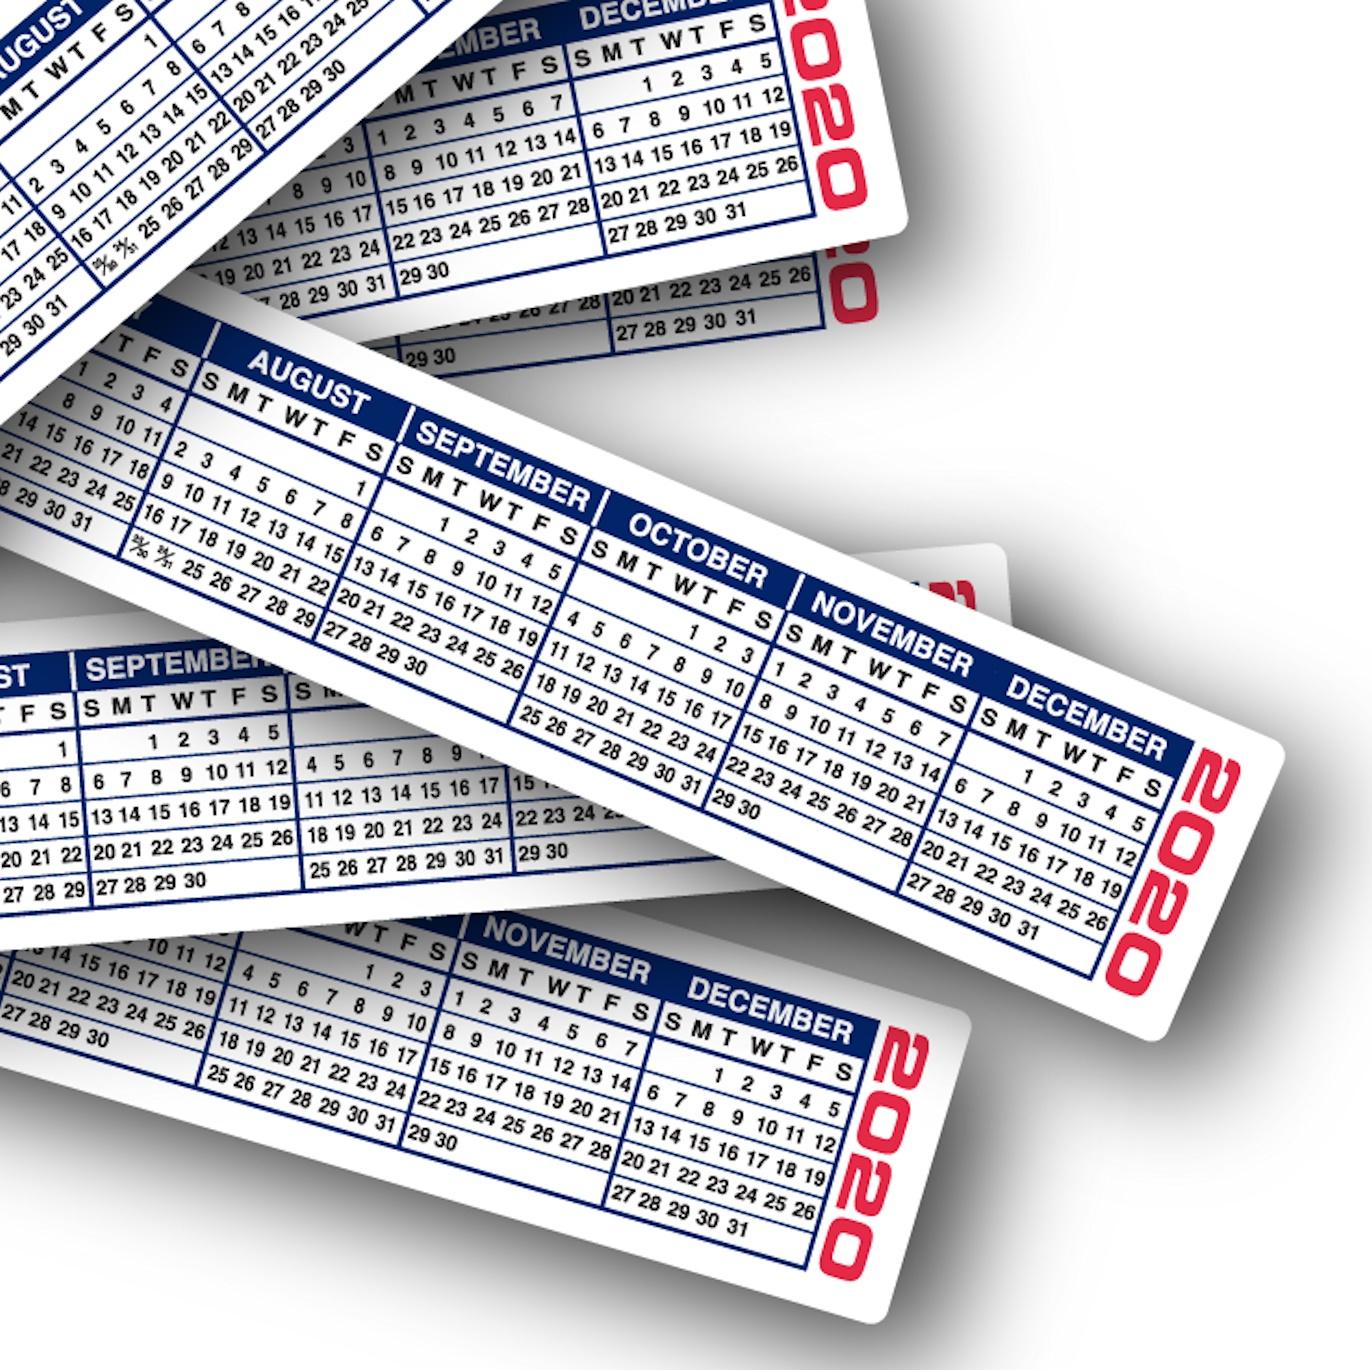 2020 Calendar Strips | Keyboard & Monitor Calendar Strips